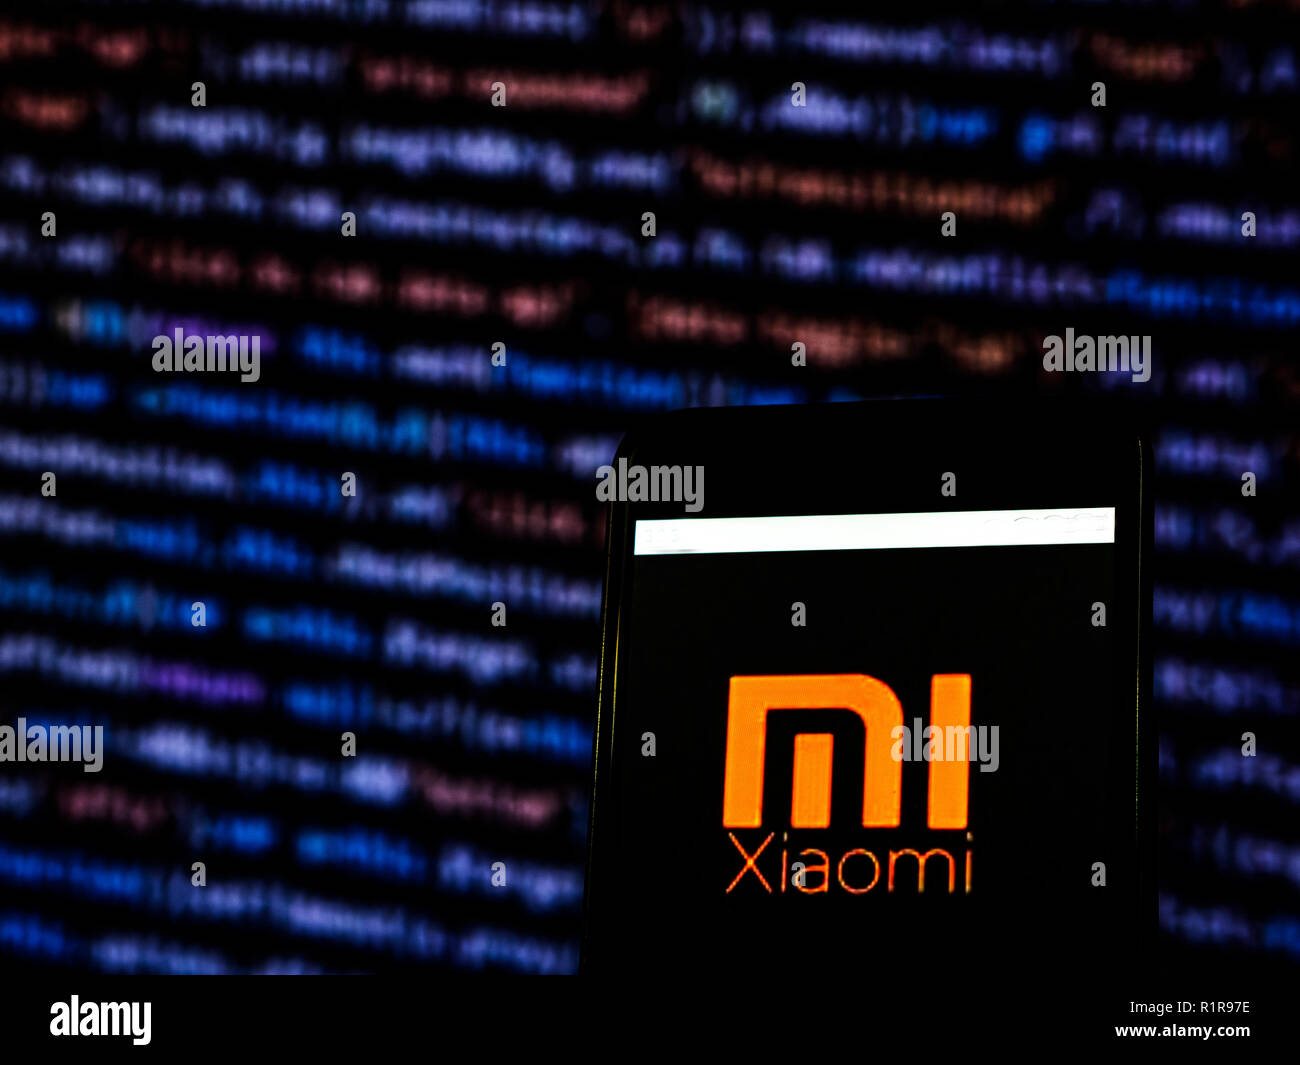 Xiaomi Consumer electronics company logo seen displayed on smart